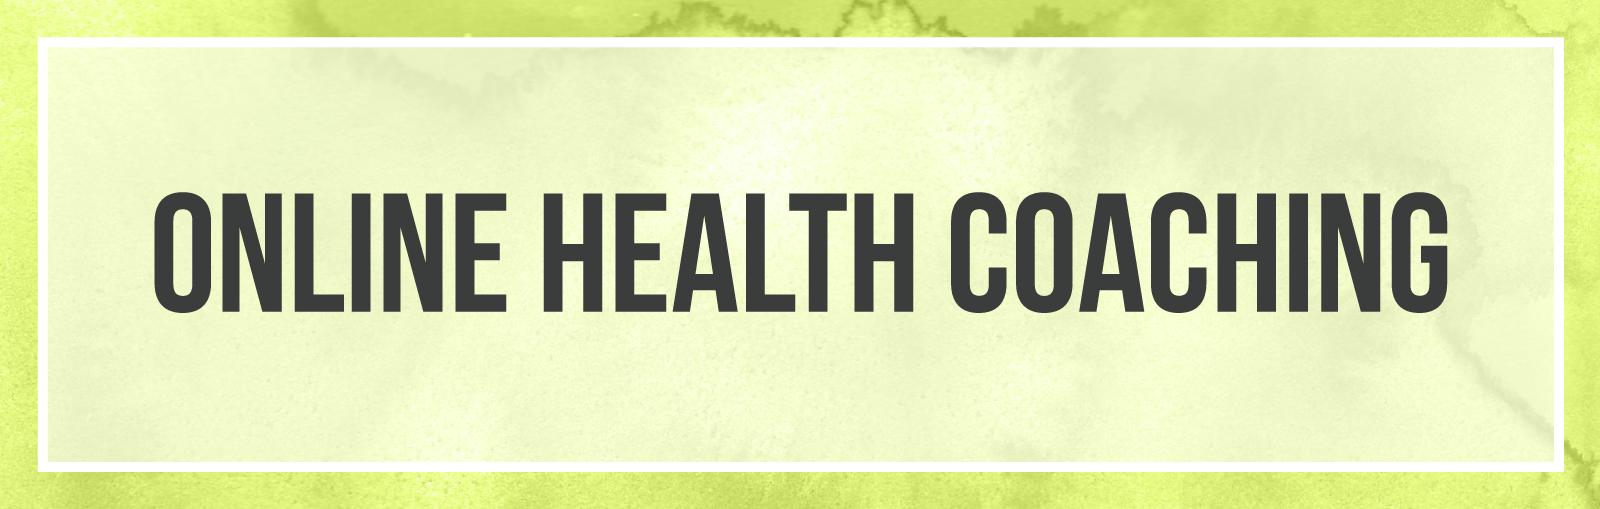 online health coaching by carolina barton